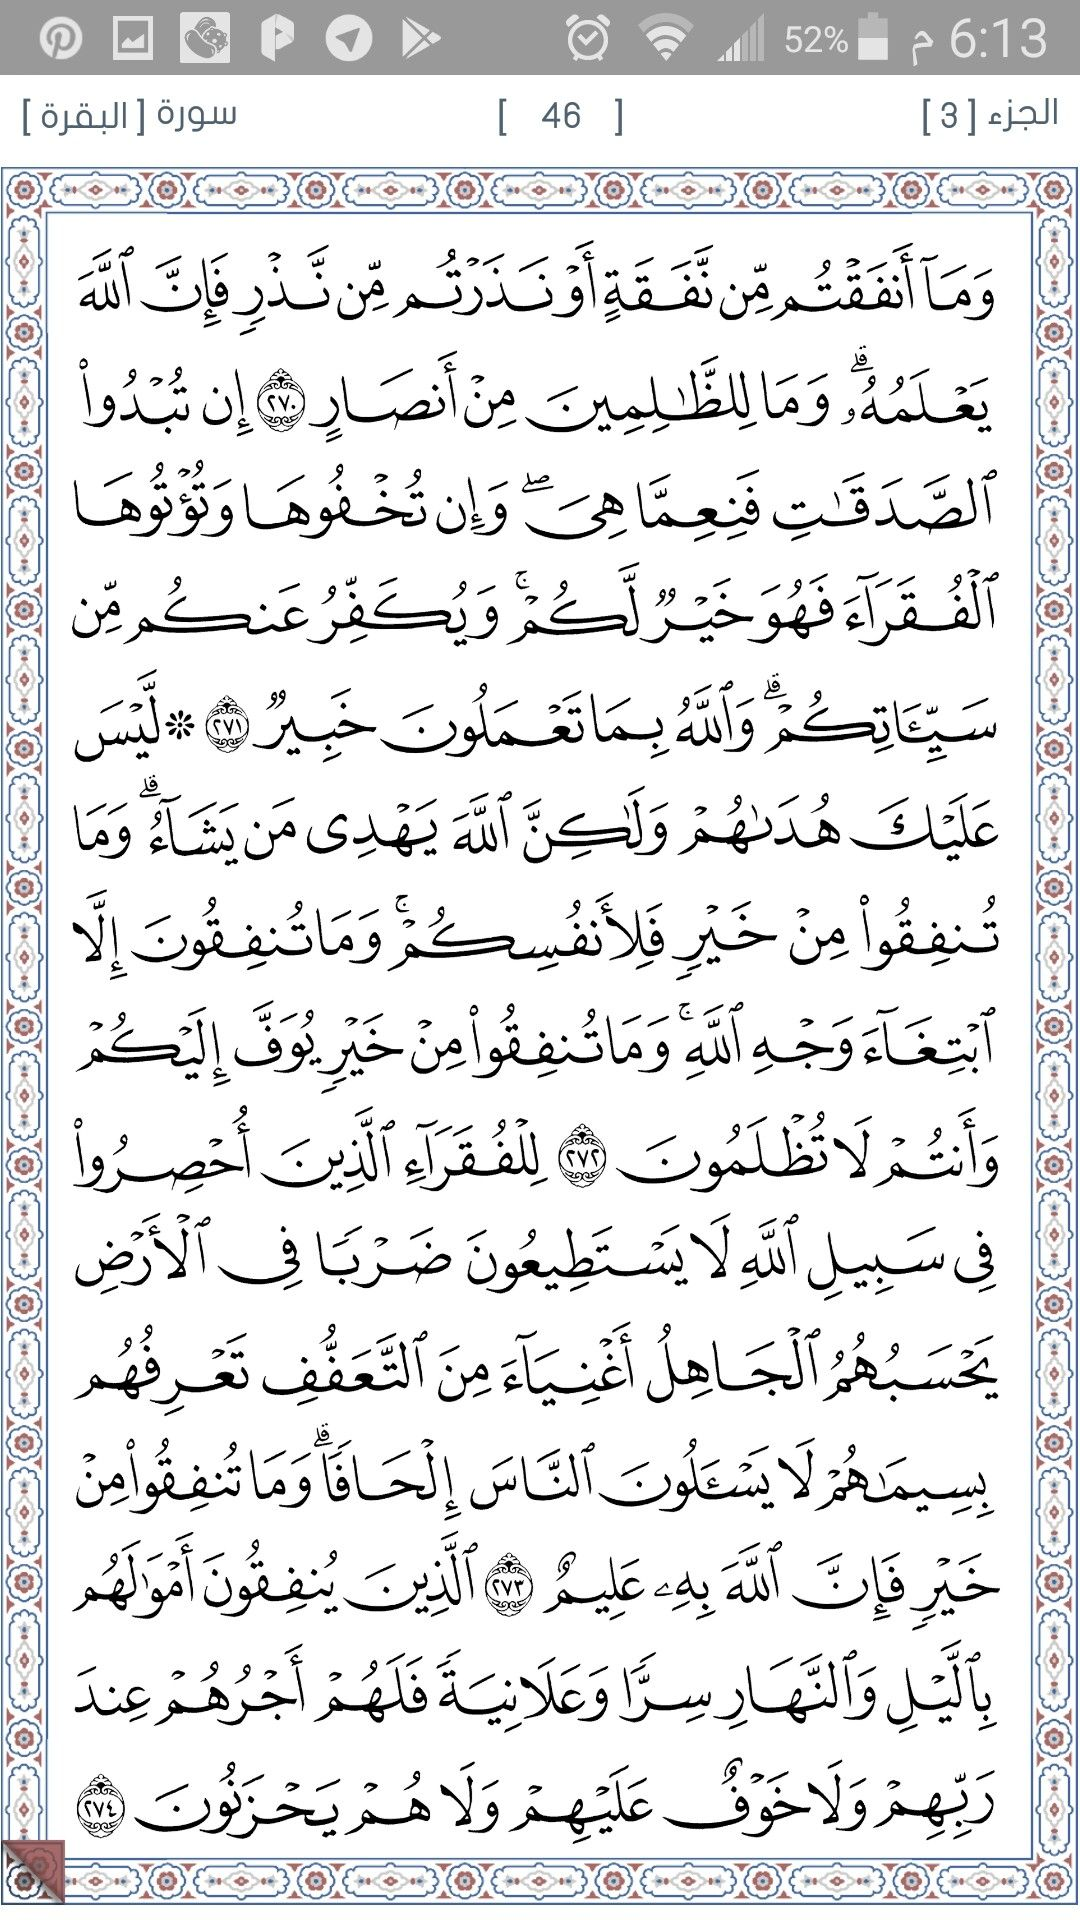 Pin By Xxxxx On تطبيق القرآن الكريم Quran Verses Verses Quran